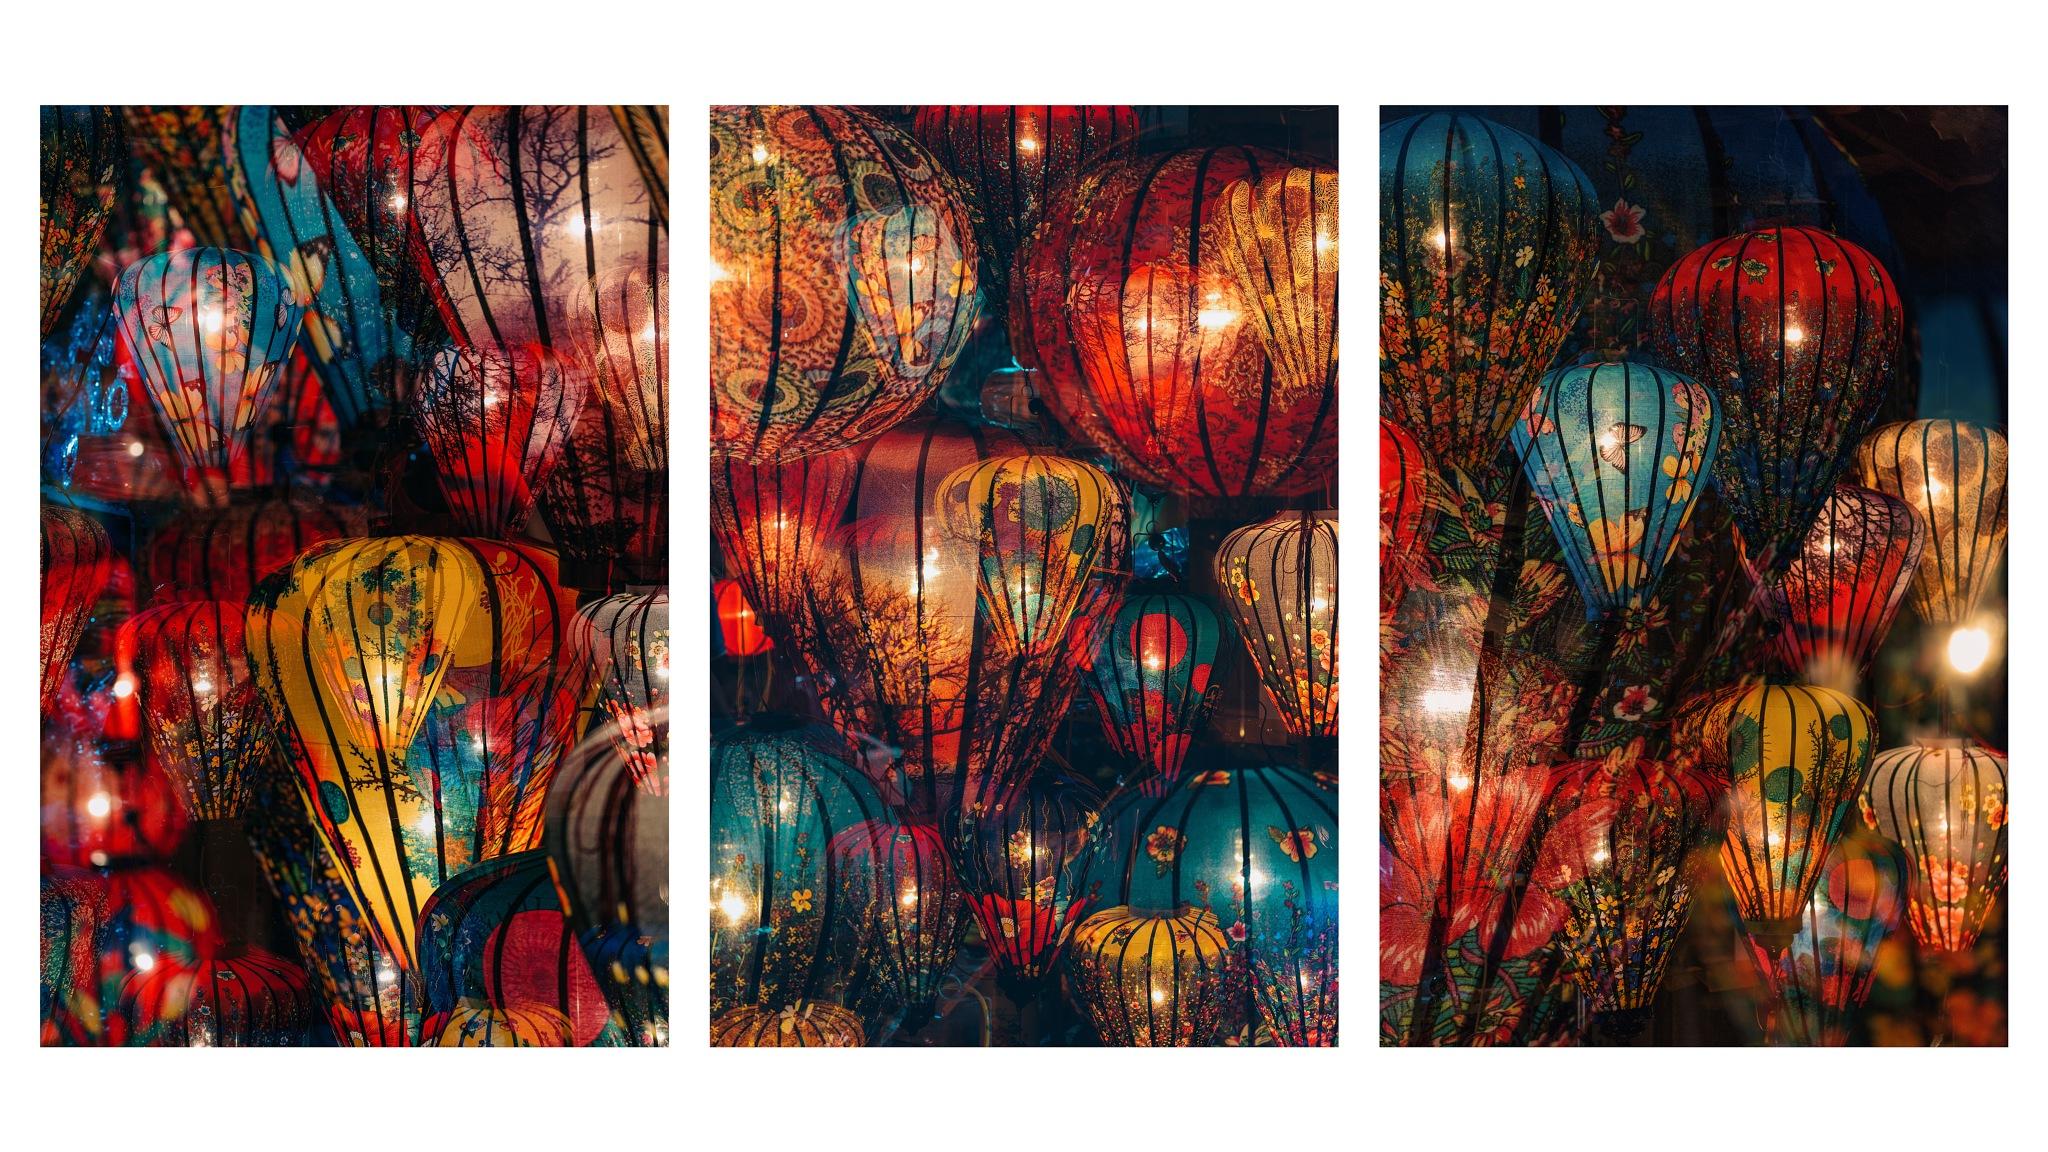 A Sea of Lanterns II (Triptych) by Peter Stewart